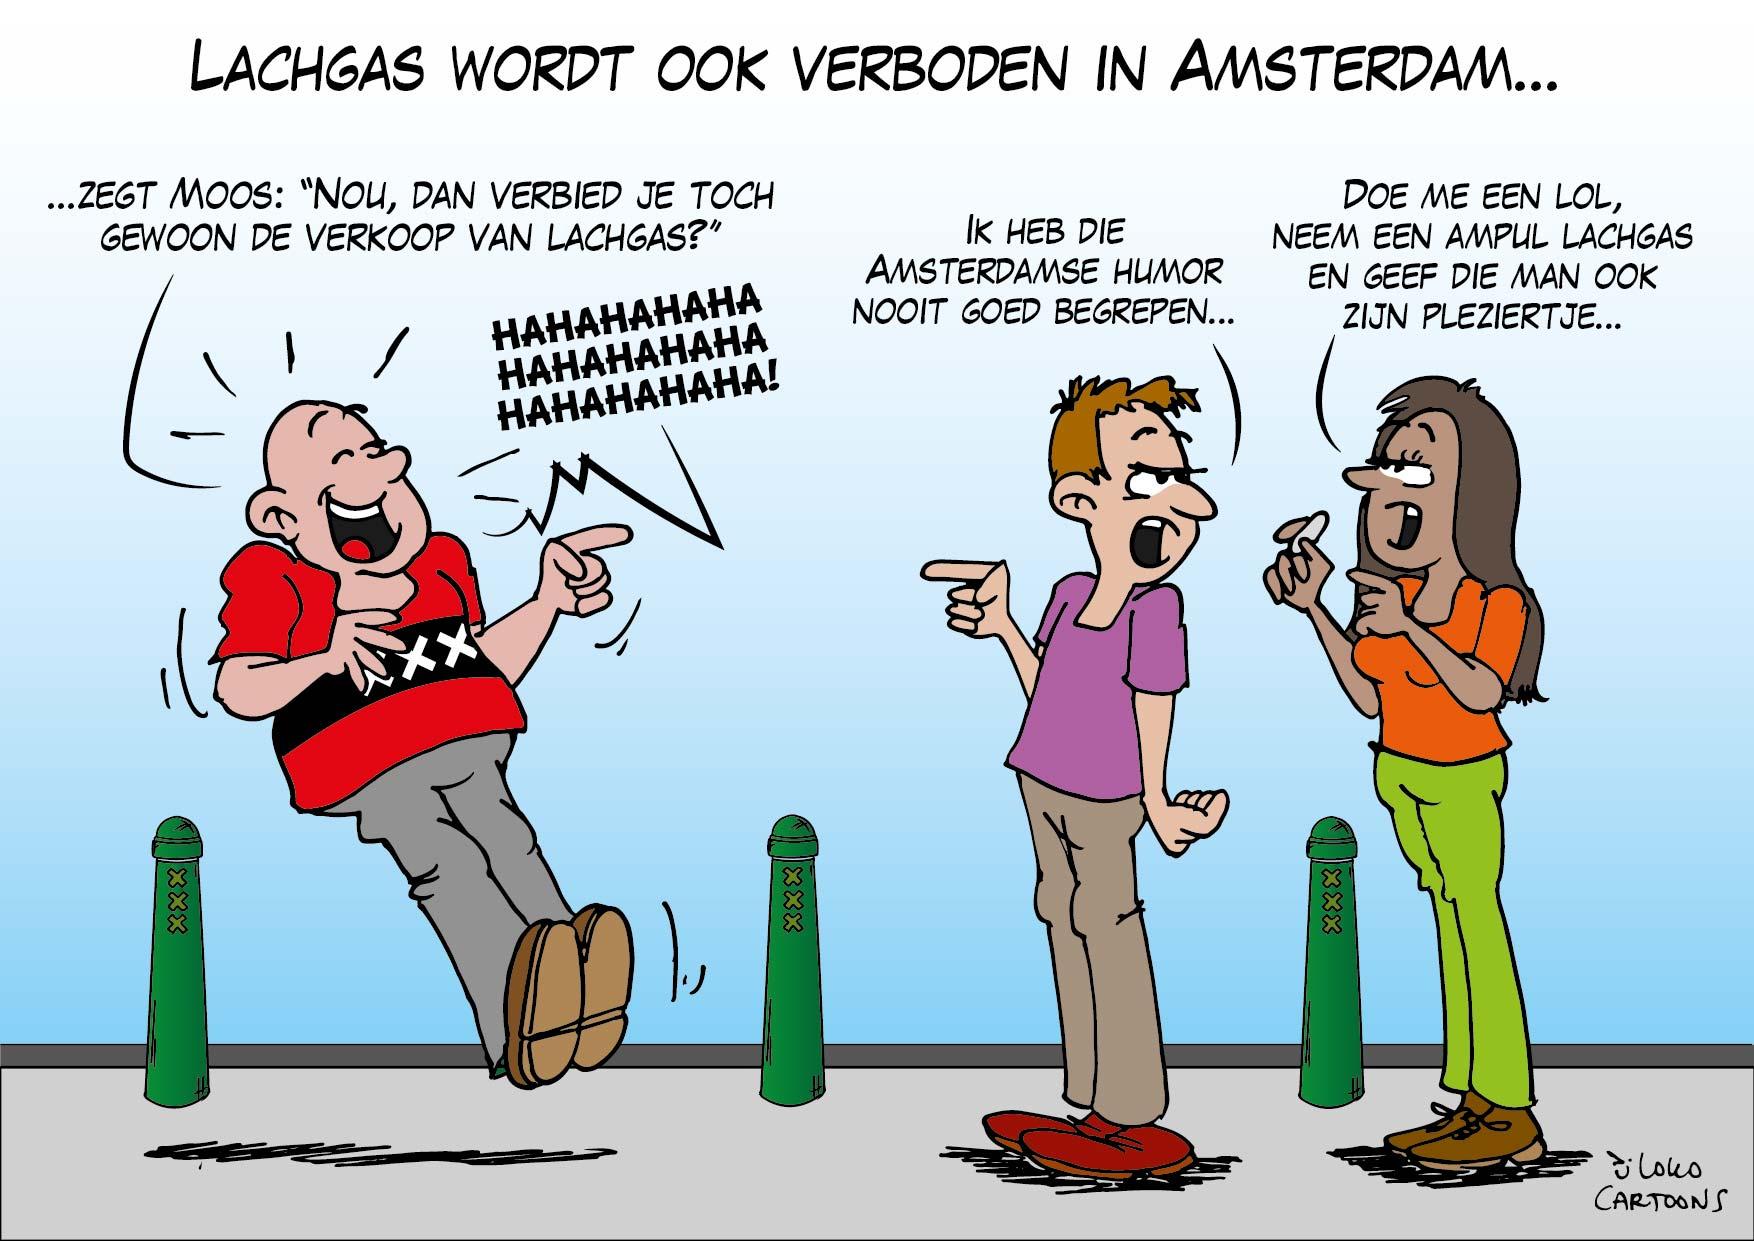 Lachgas wordt ook verboden in Amsterdam…